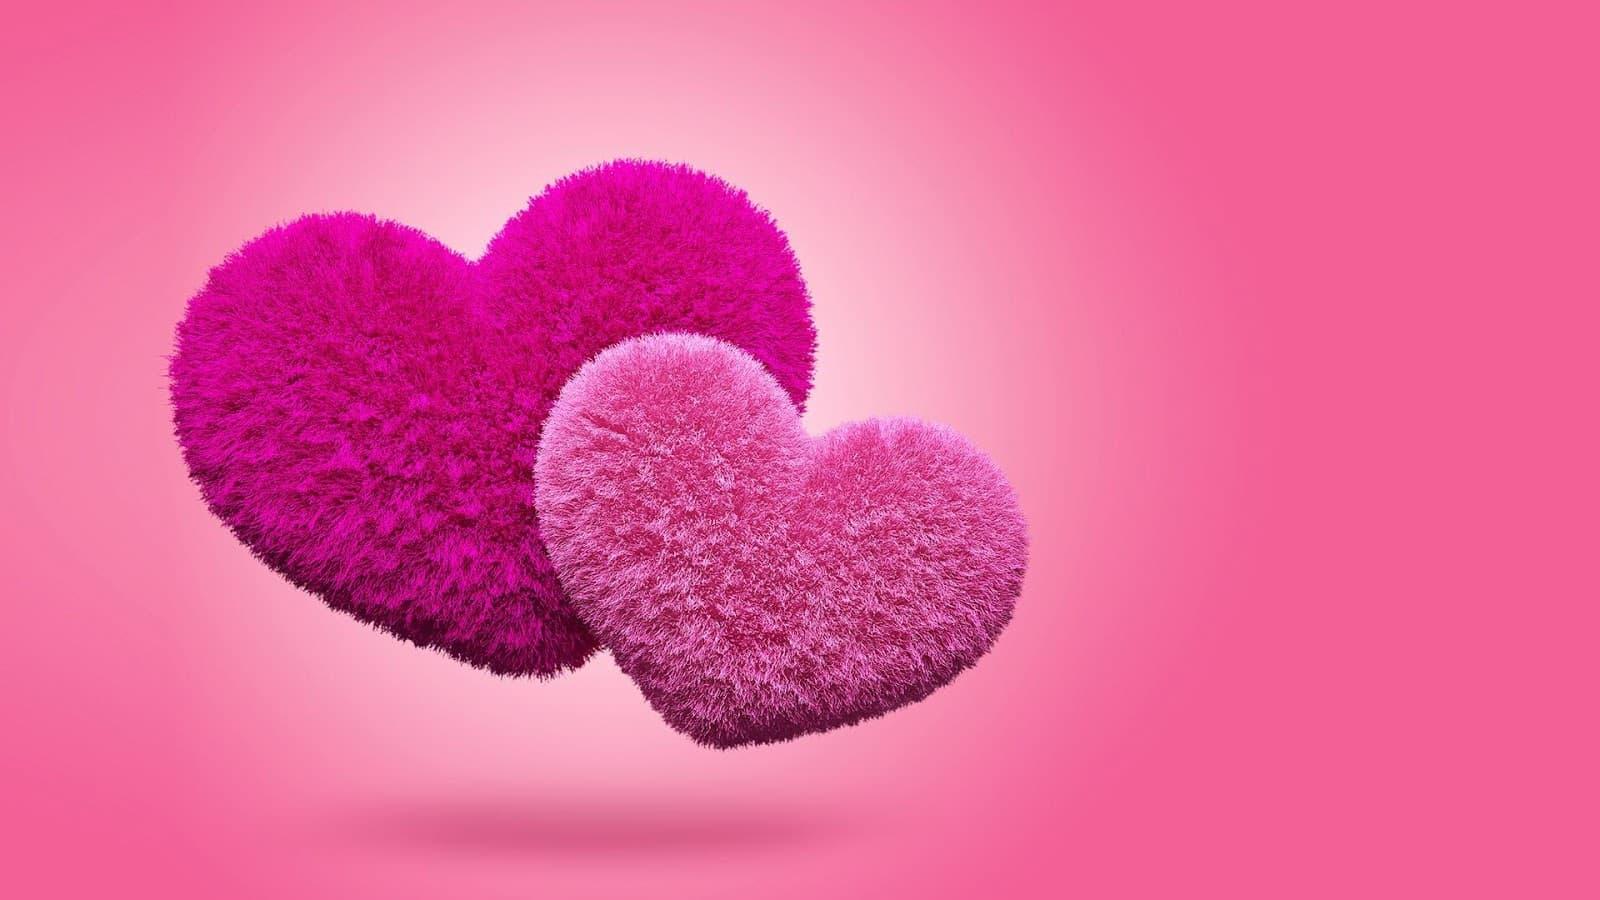 pretty heart designs wallpapers - photo #26